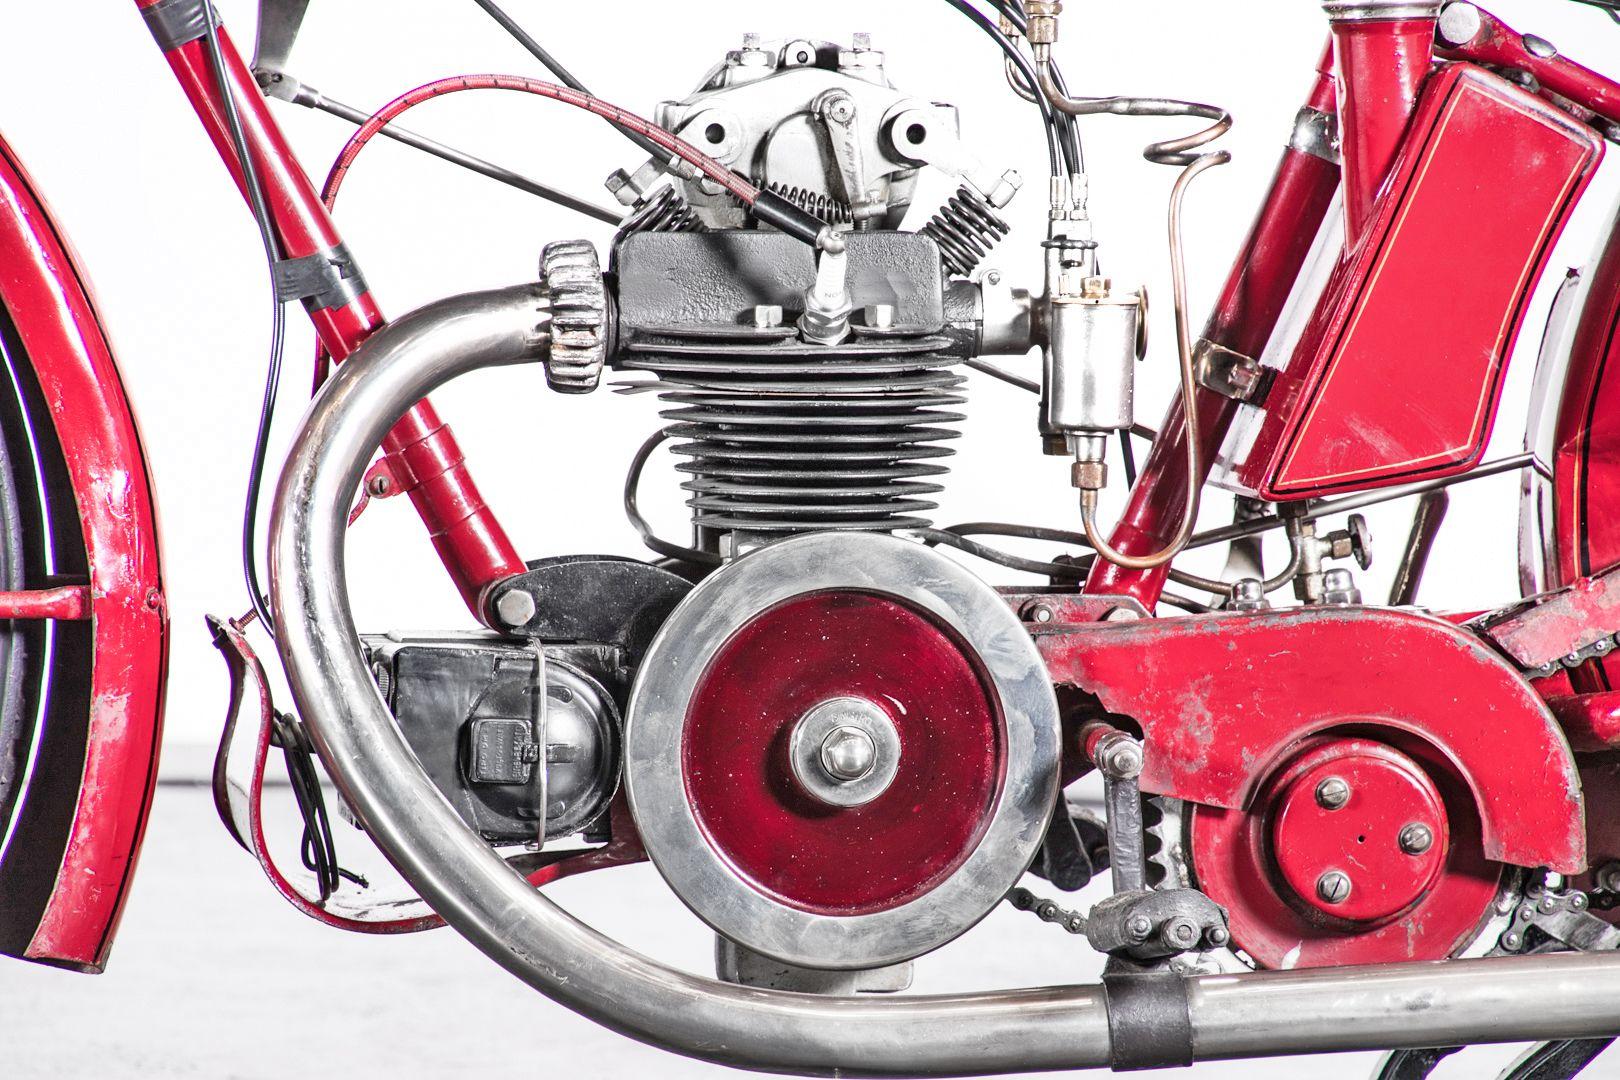 1930 Benelli 175 74353